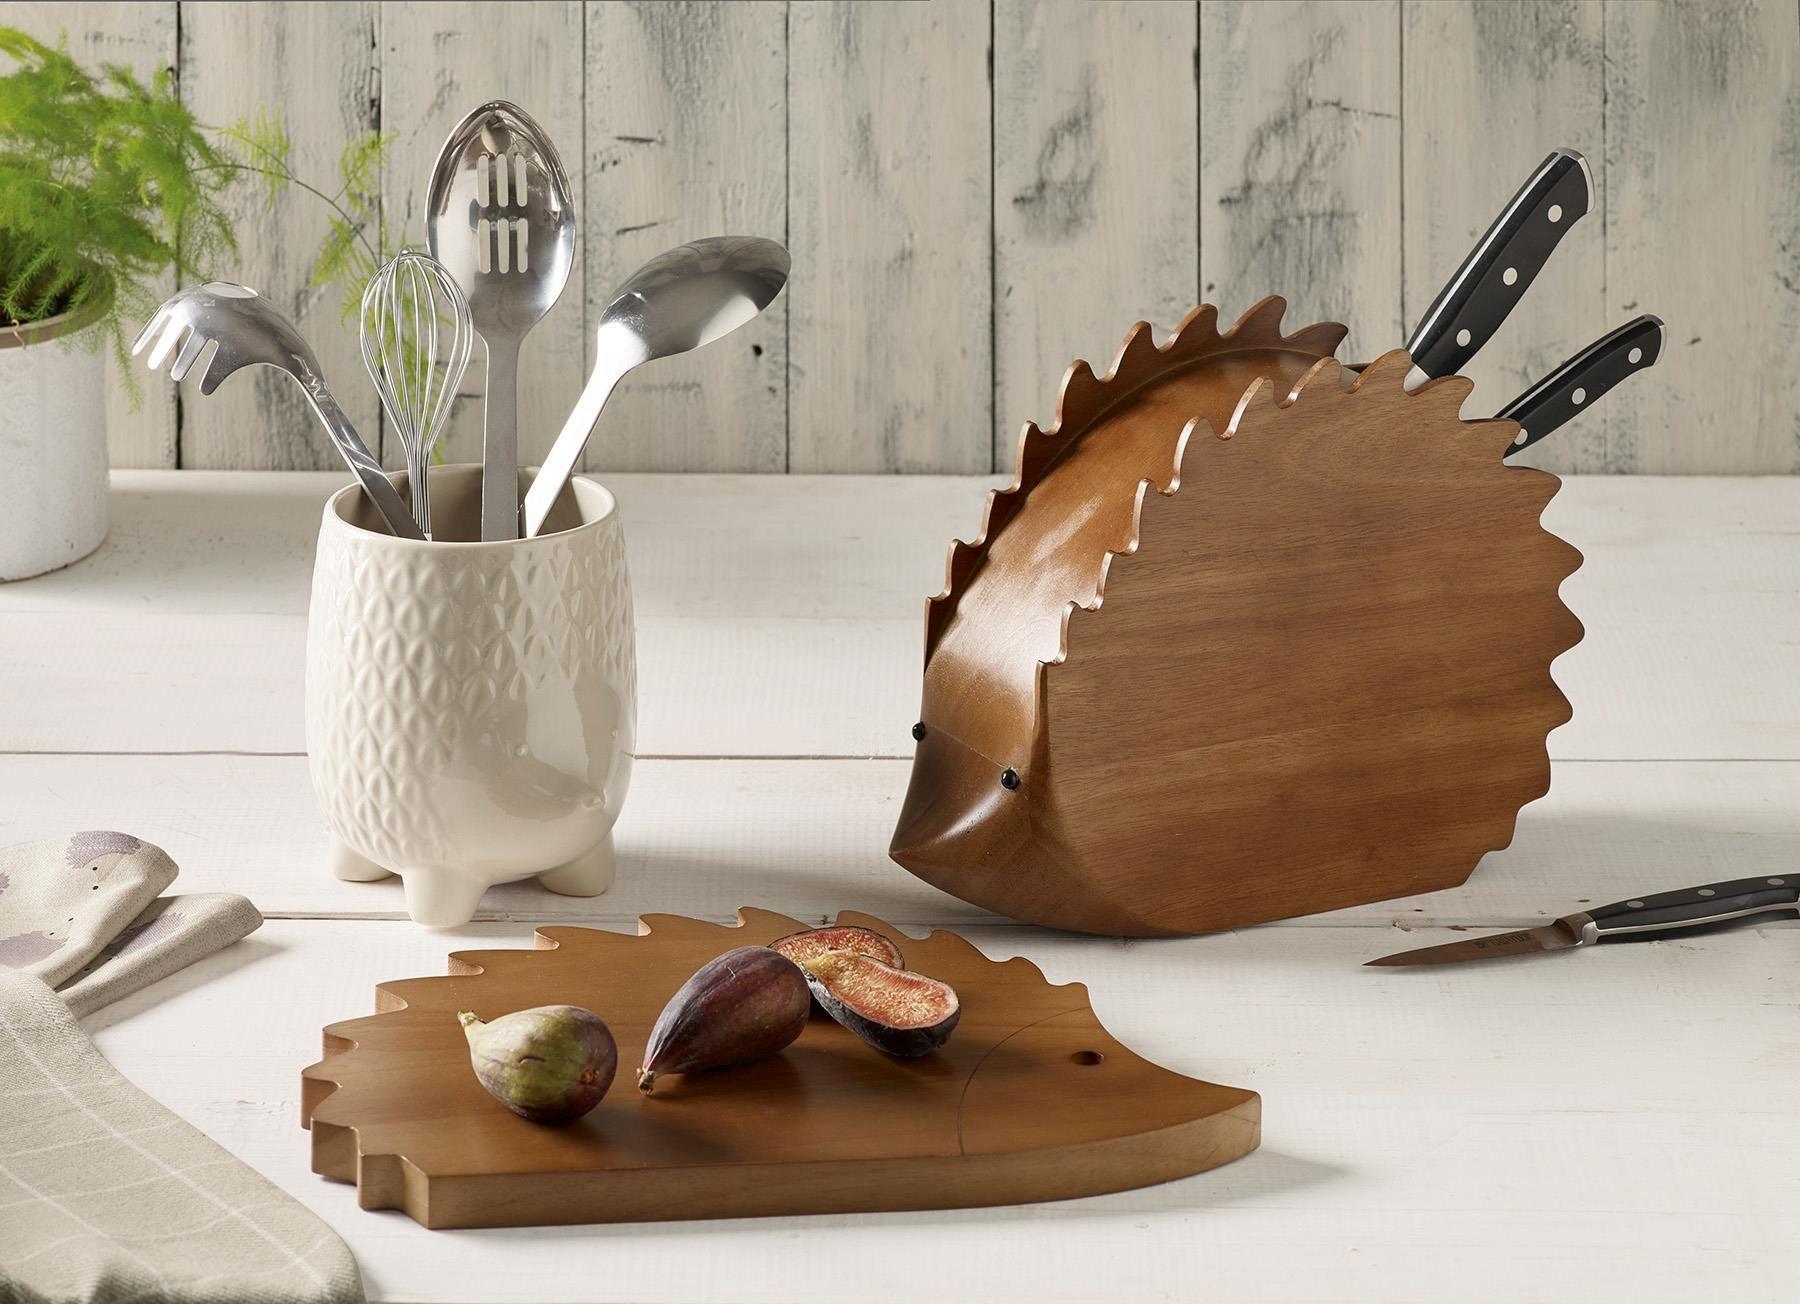 Buy Hedgehog Knife Block from the Next UK online shop in 2020